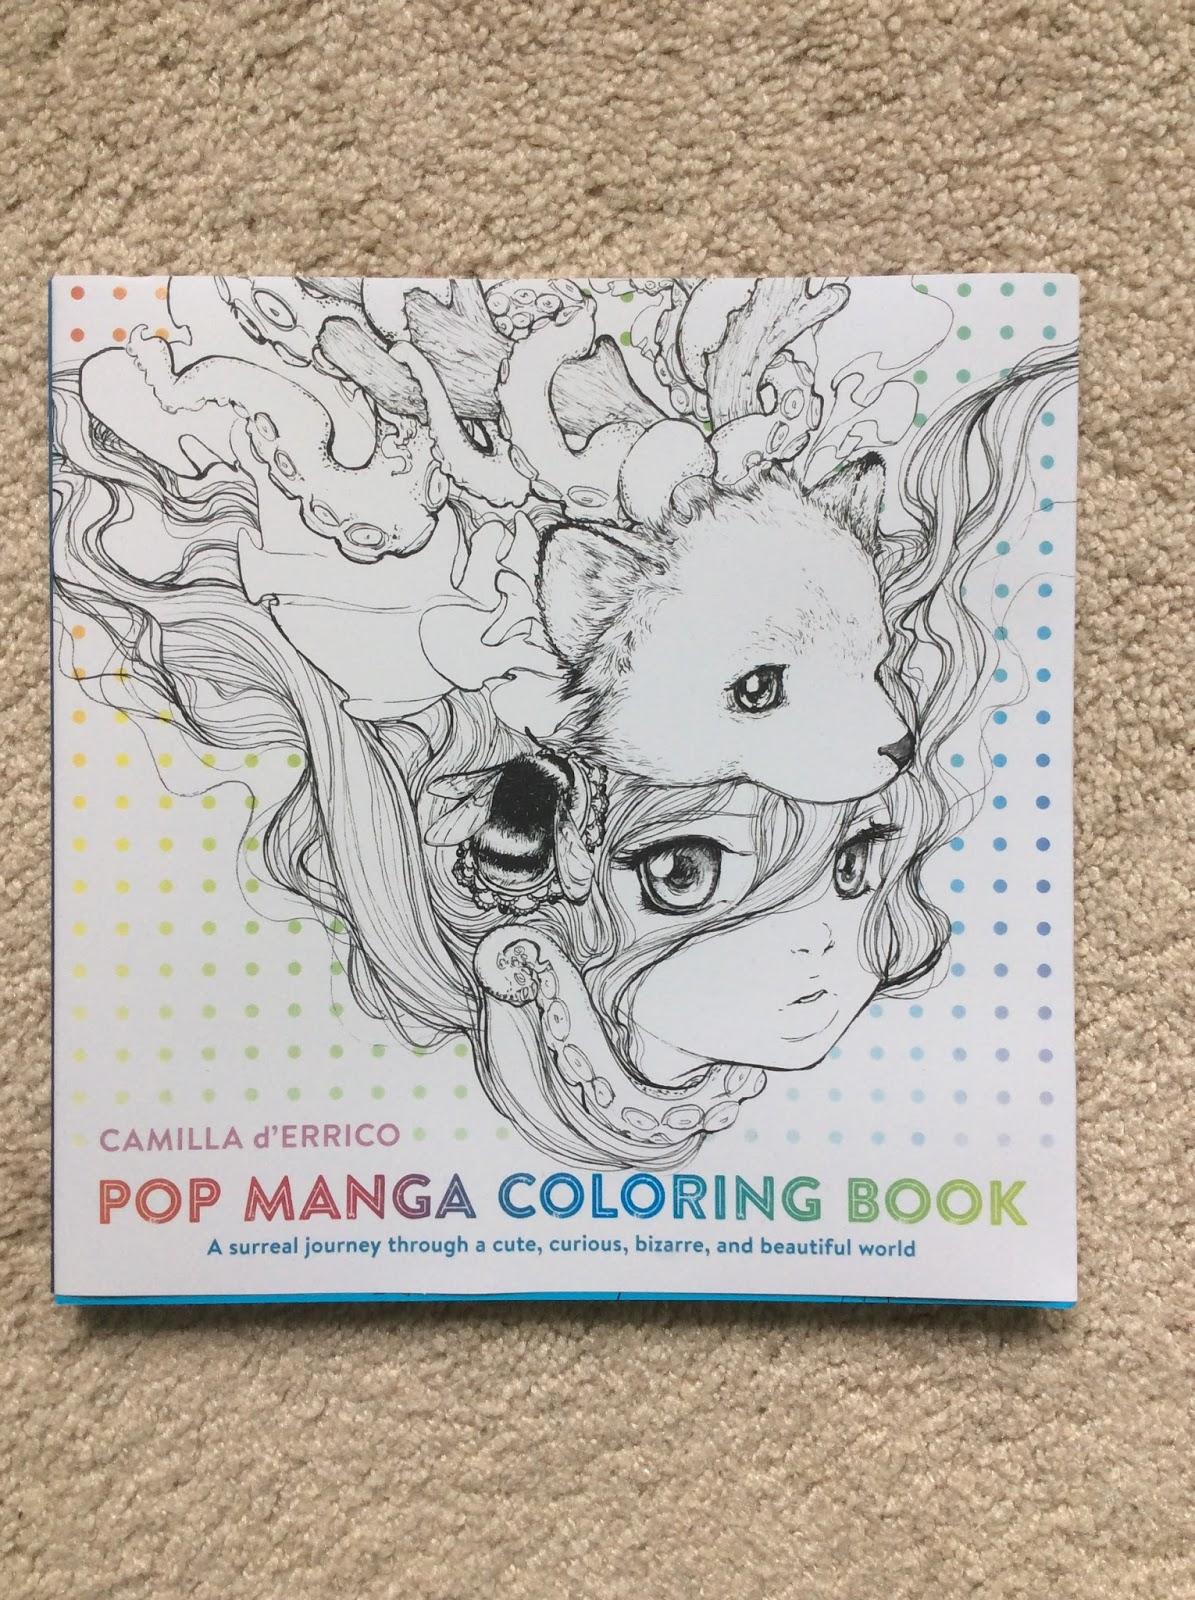 Nesca's Nook: Pop Manga Coloring Book by Camilla d'Errico